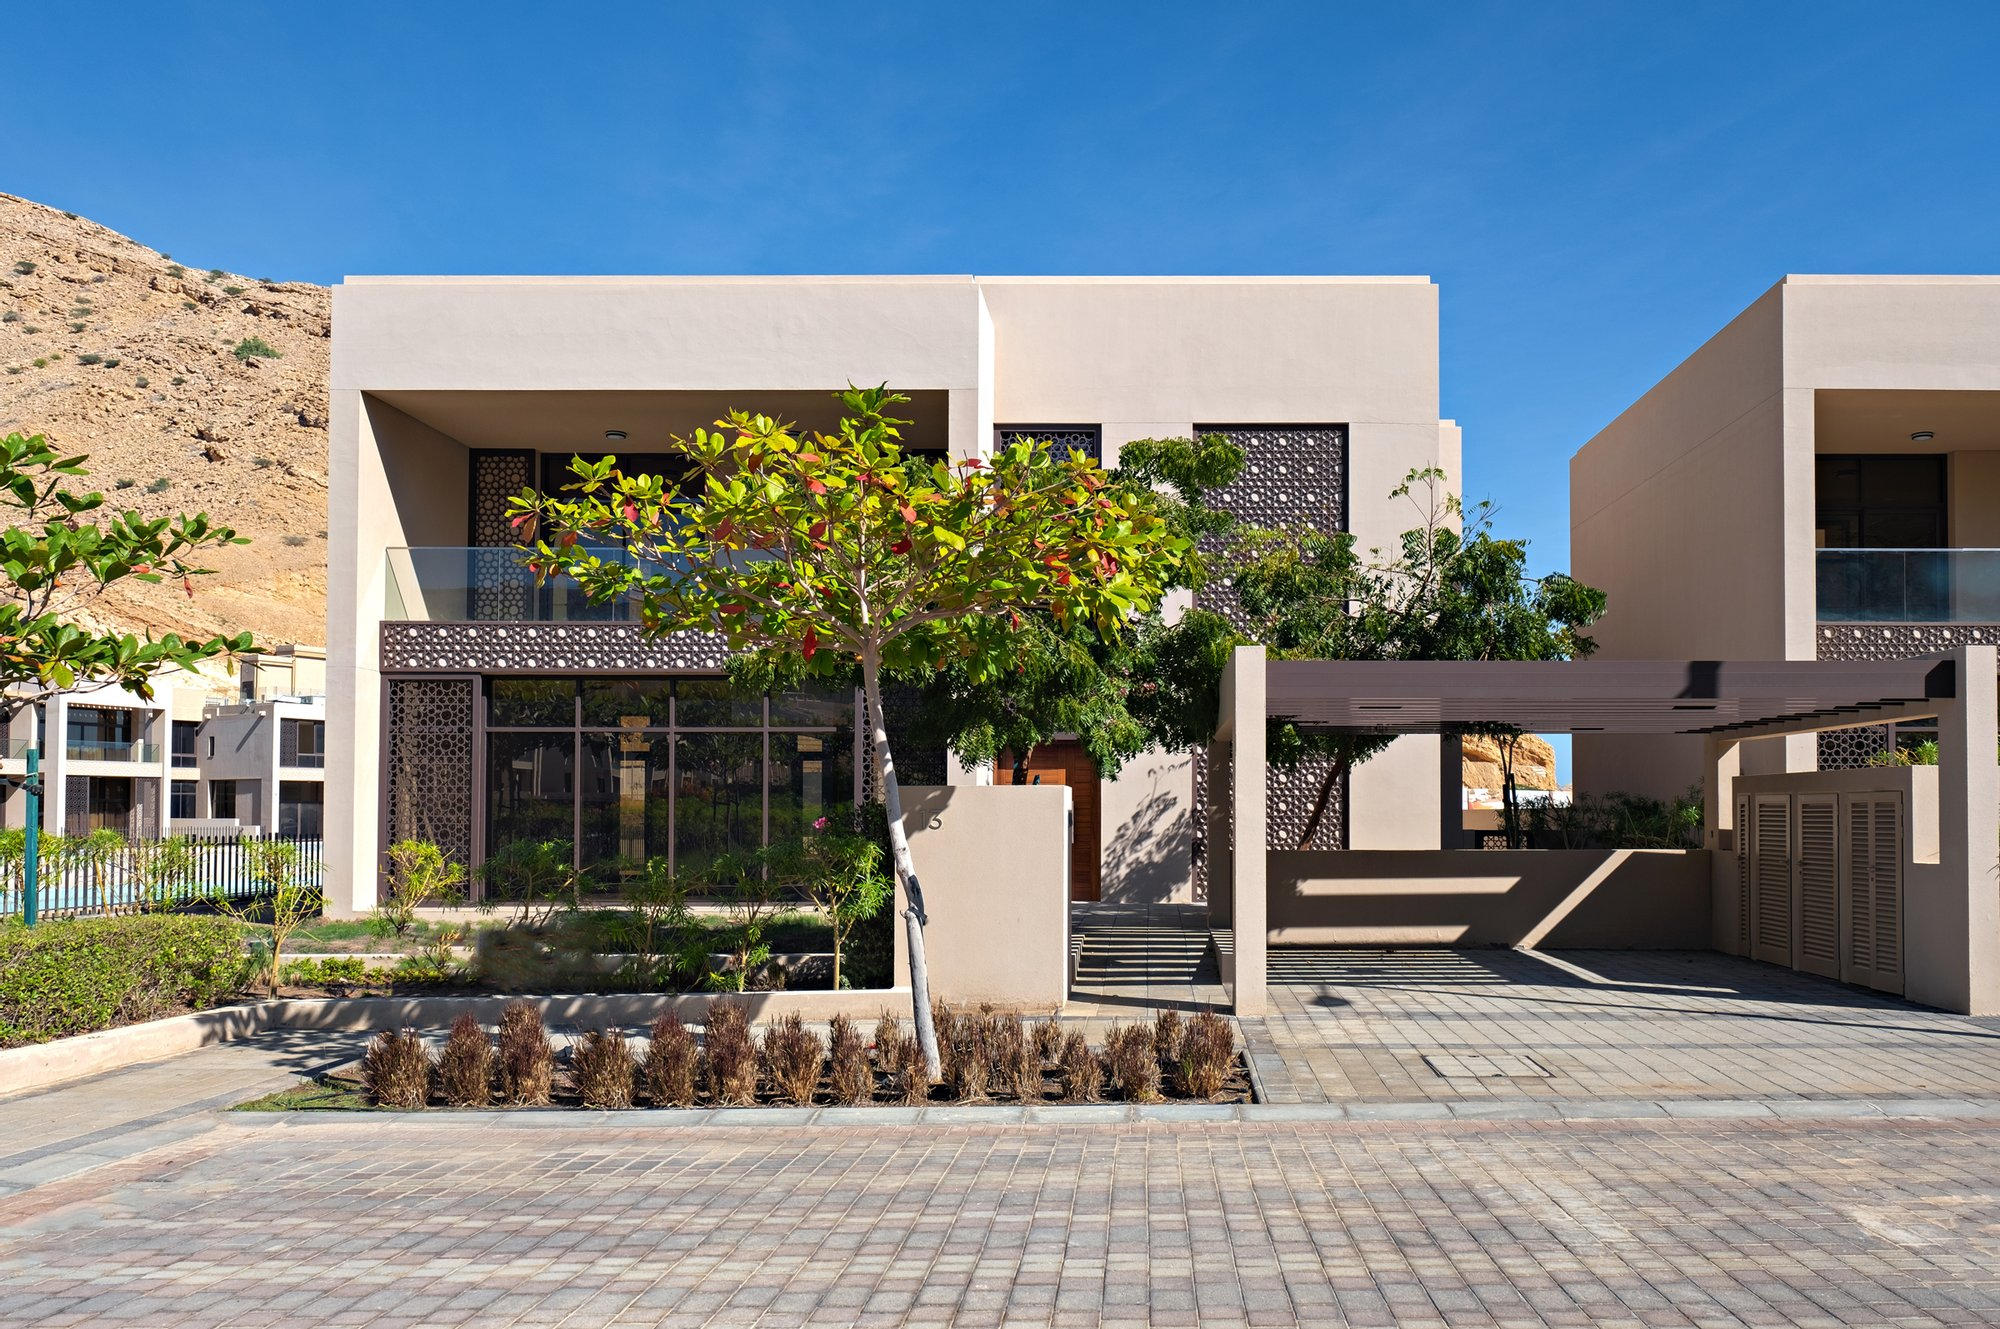 Casa a Mascate, Mascate, Oman 1 - 11385587